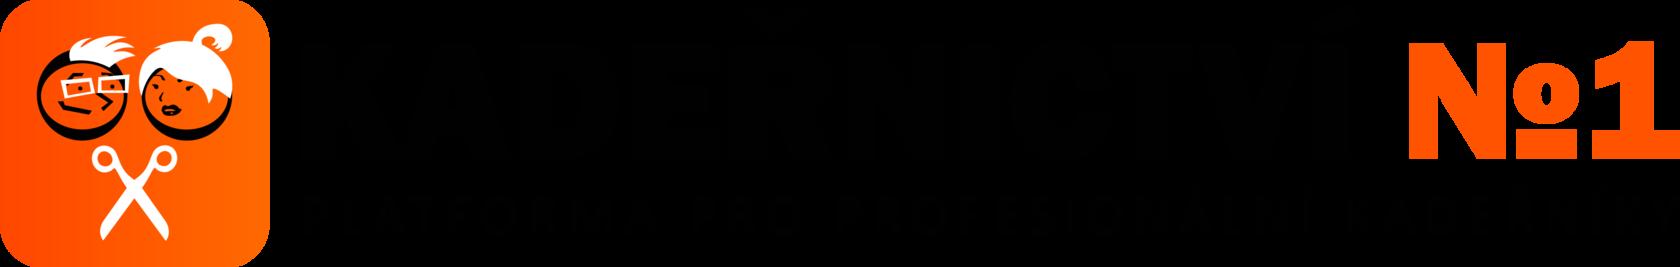 kadeřnictví n1 kadeřnictví no 1 kadeřnictví no1 kadeřnictví number 1 100 czk klier gentlemens brothers salon praha парикмахерская в праге стрижка no.1 #1 №1 Hair Salon No.1 kadernictvi1 1kadernictvi